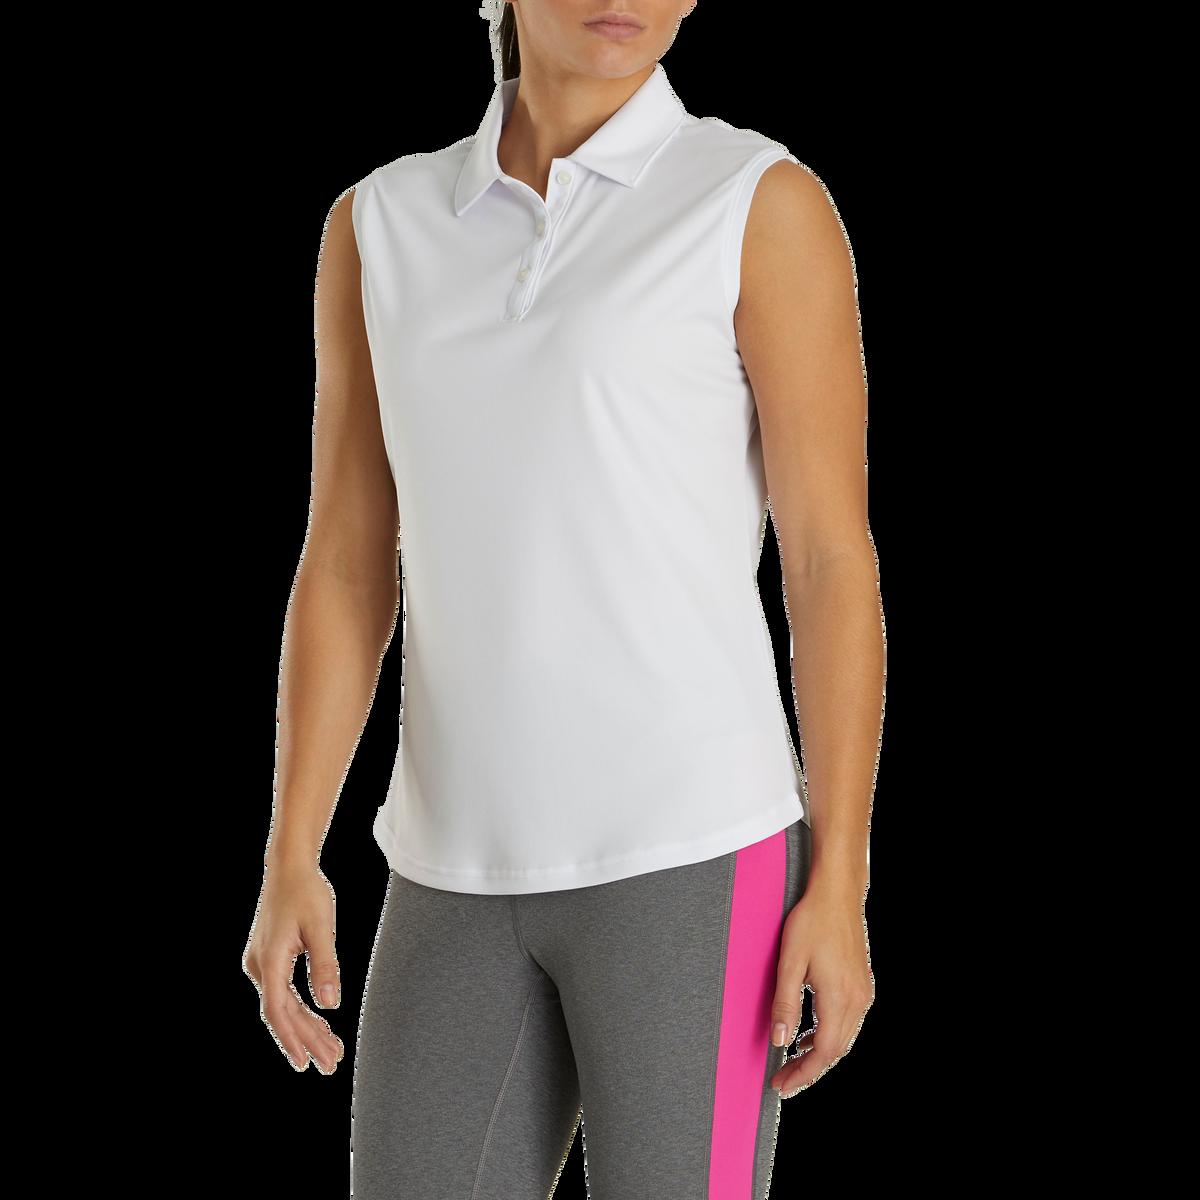 ProDry Interlock Sleeveless Shirt Self Collar Women